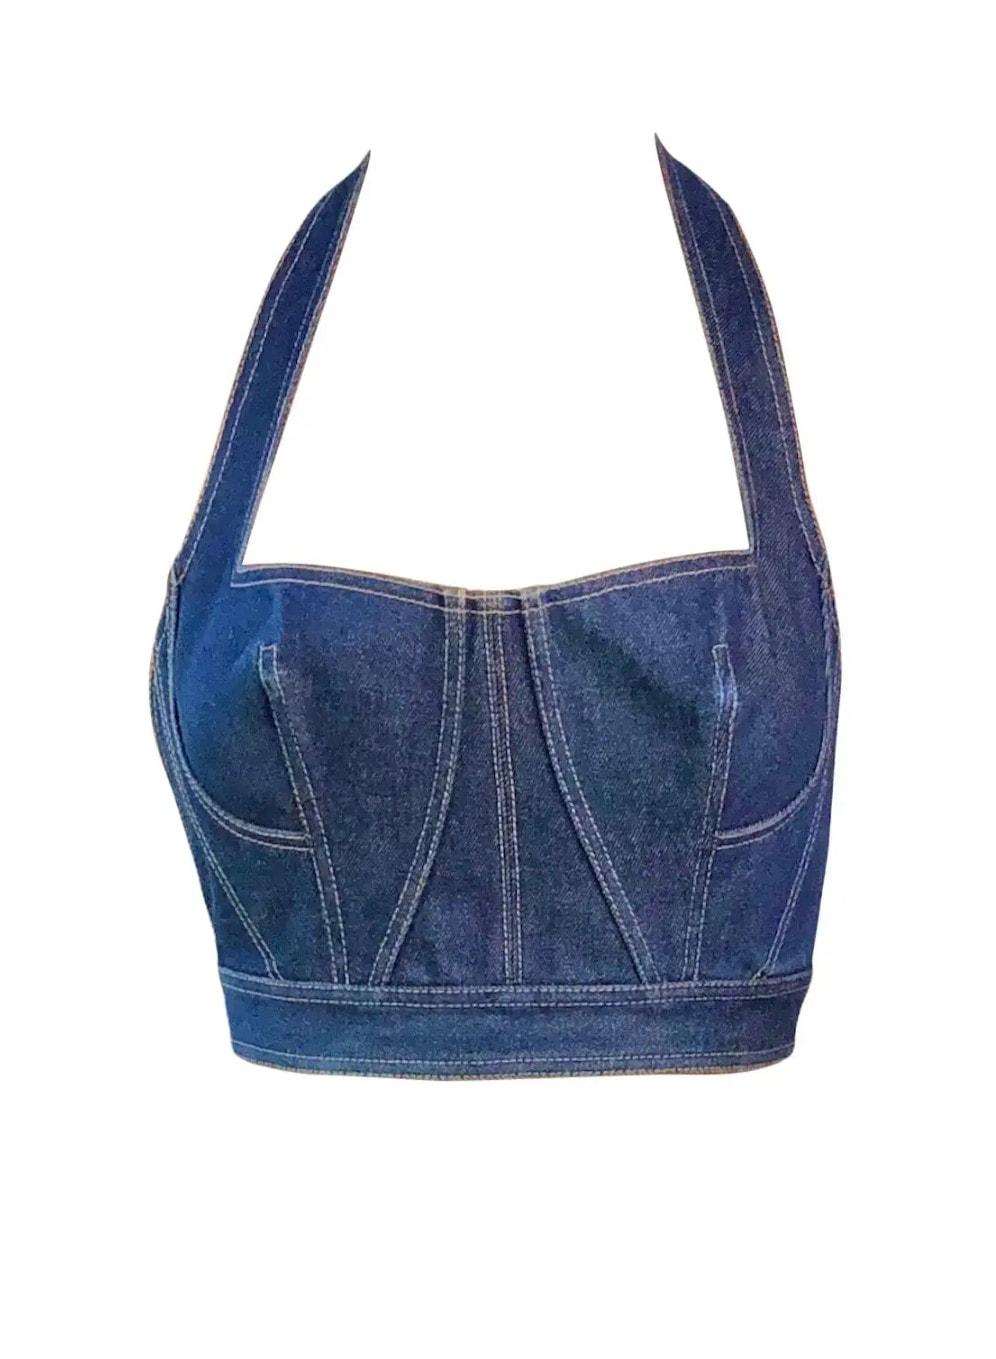 Azzedine Alaia S_S 1991 Runway Vintage Blue Denim Backless Bra Bralette Crop Top